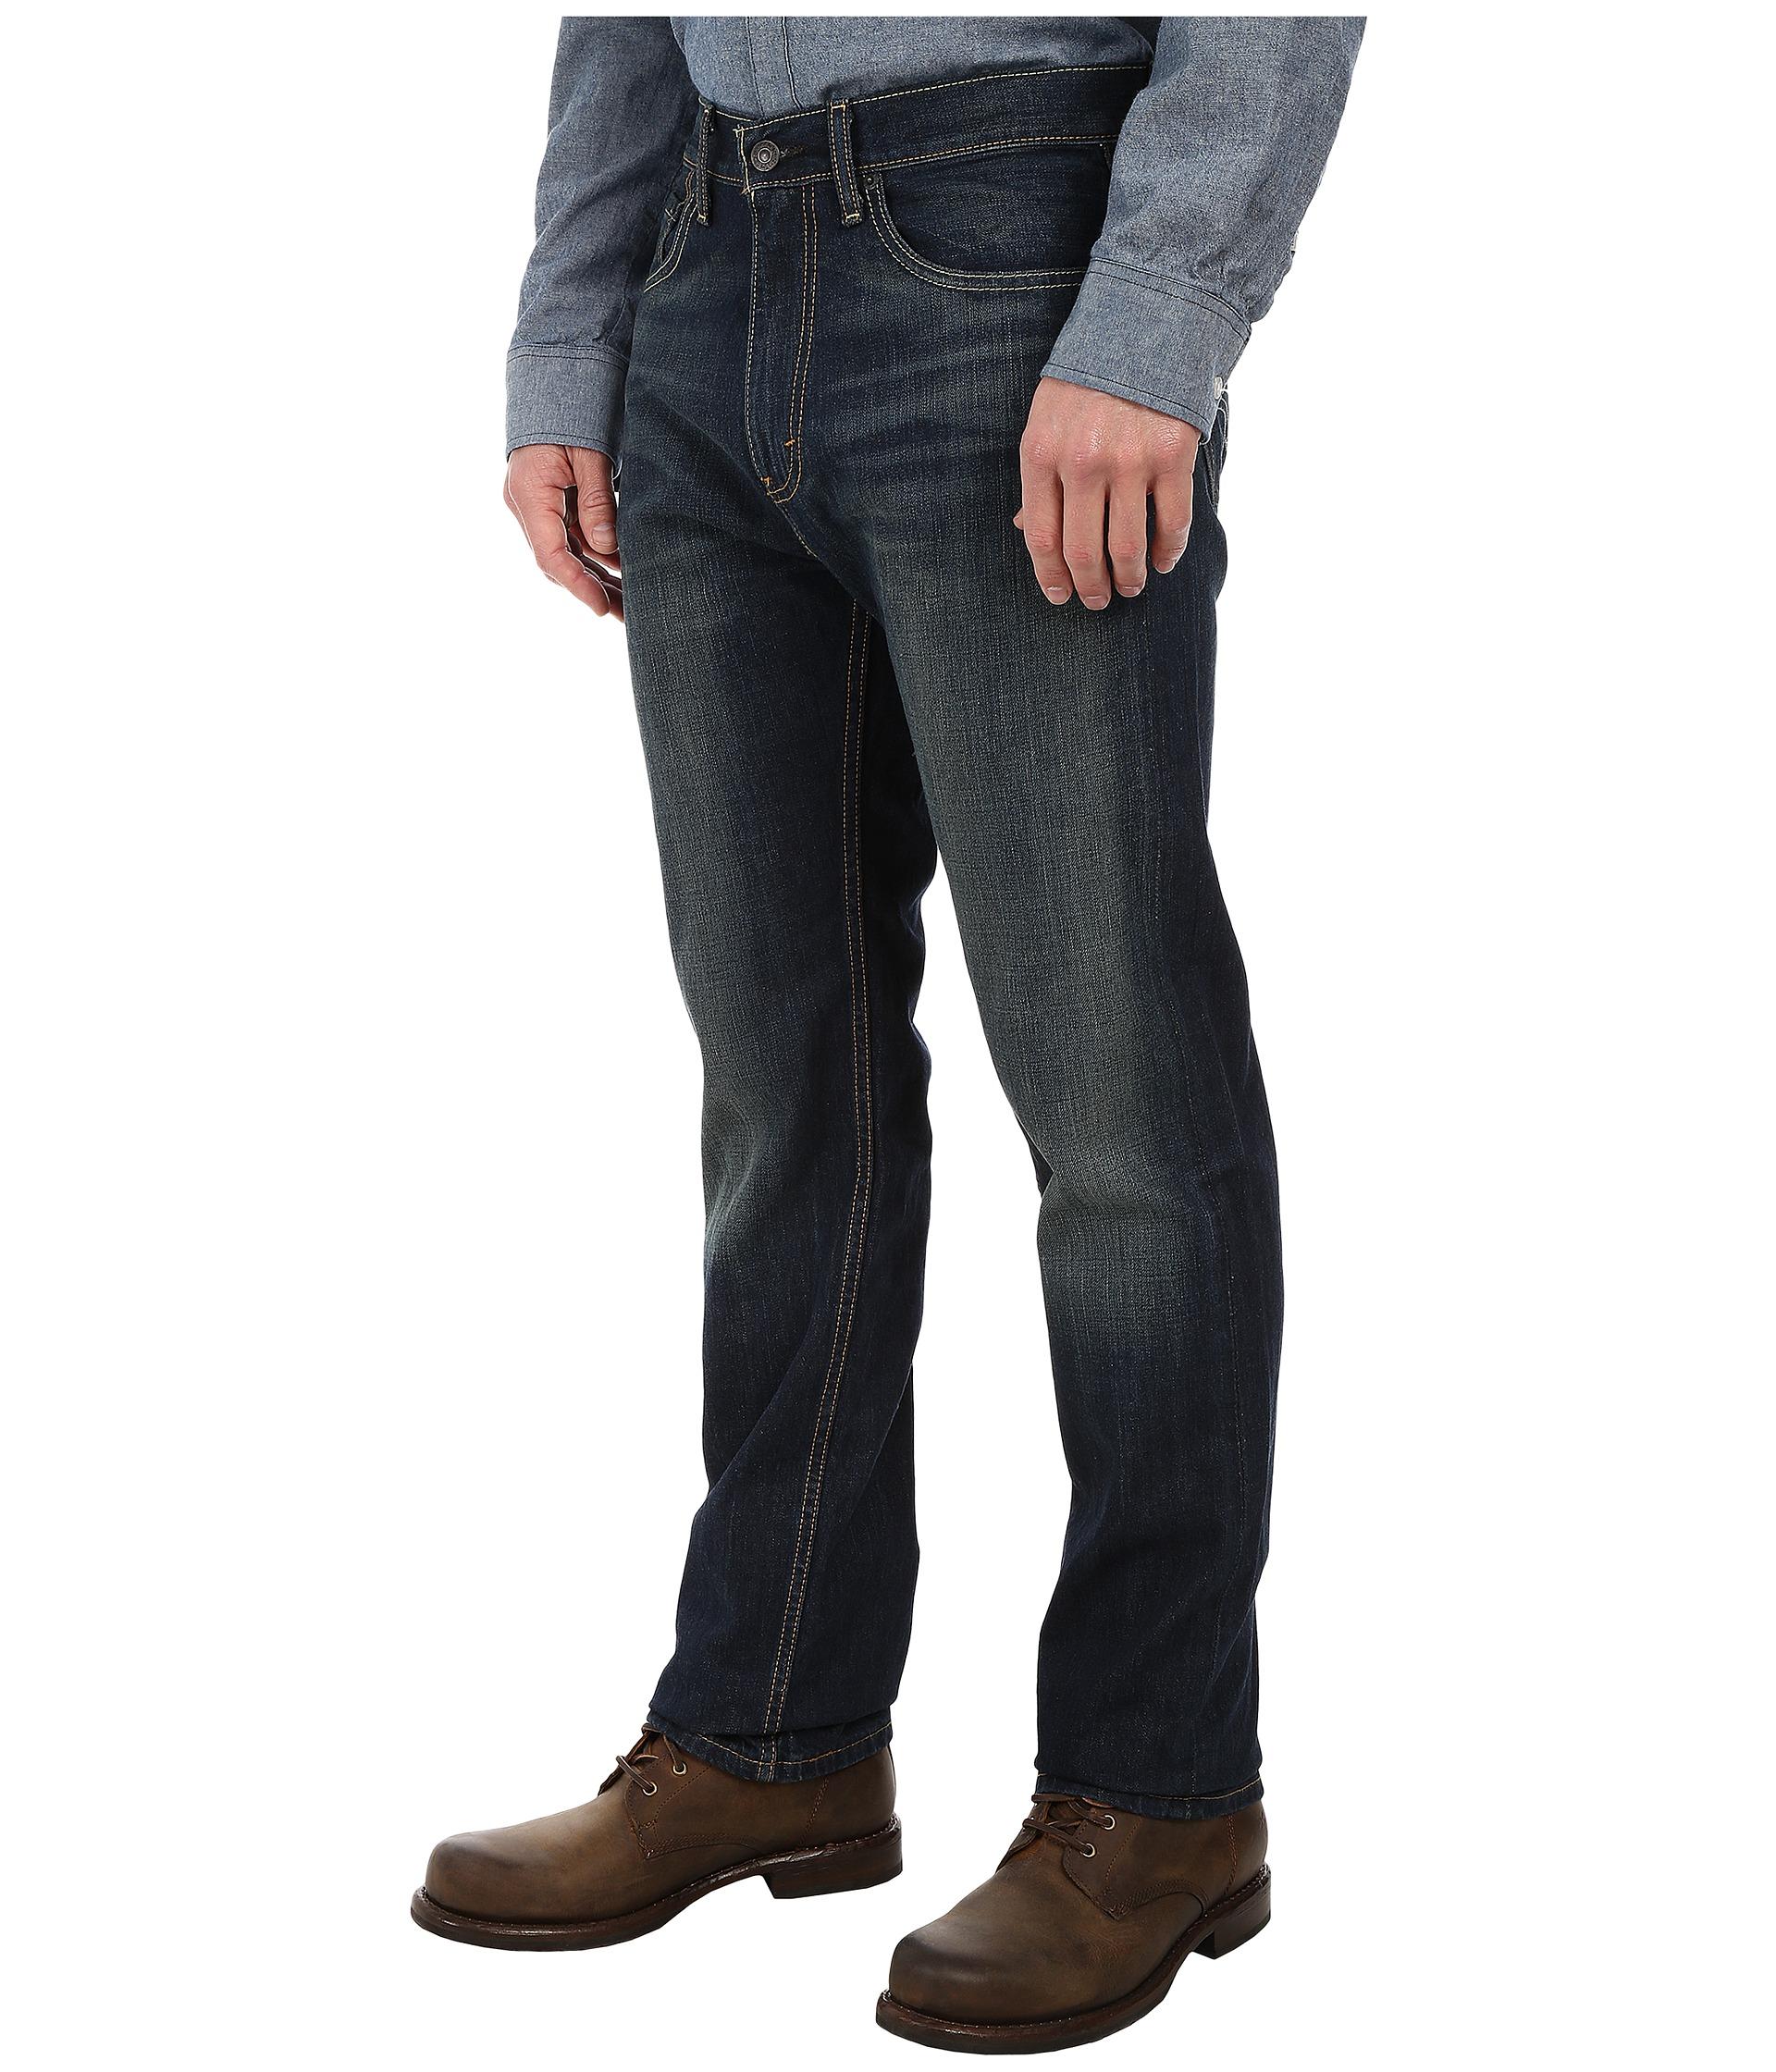 Mens Menswear Mensfashion Decorating Ideas Light Jeans Men Levi